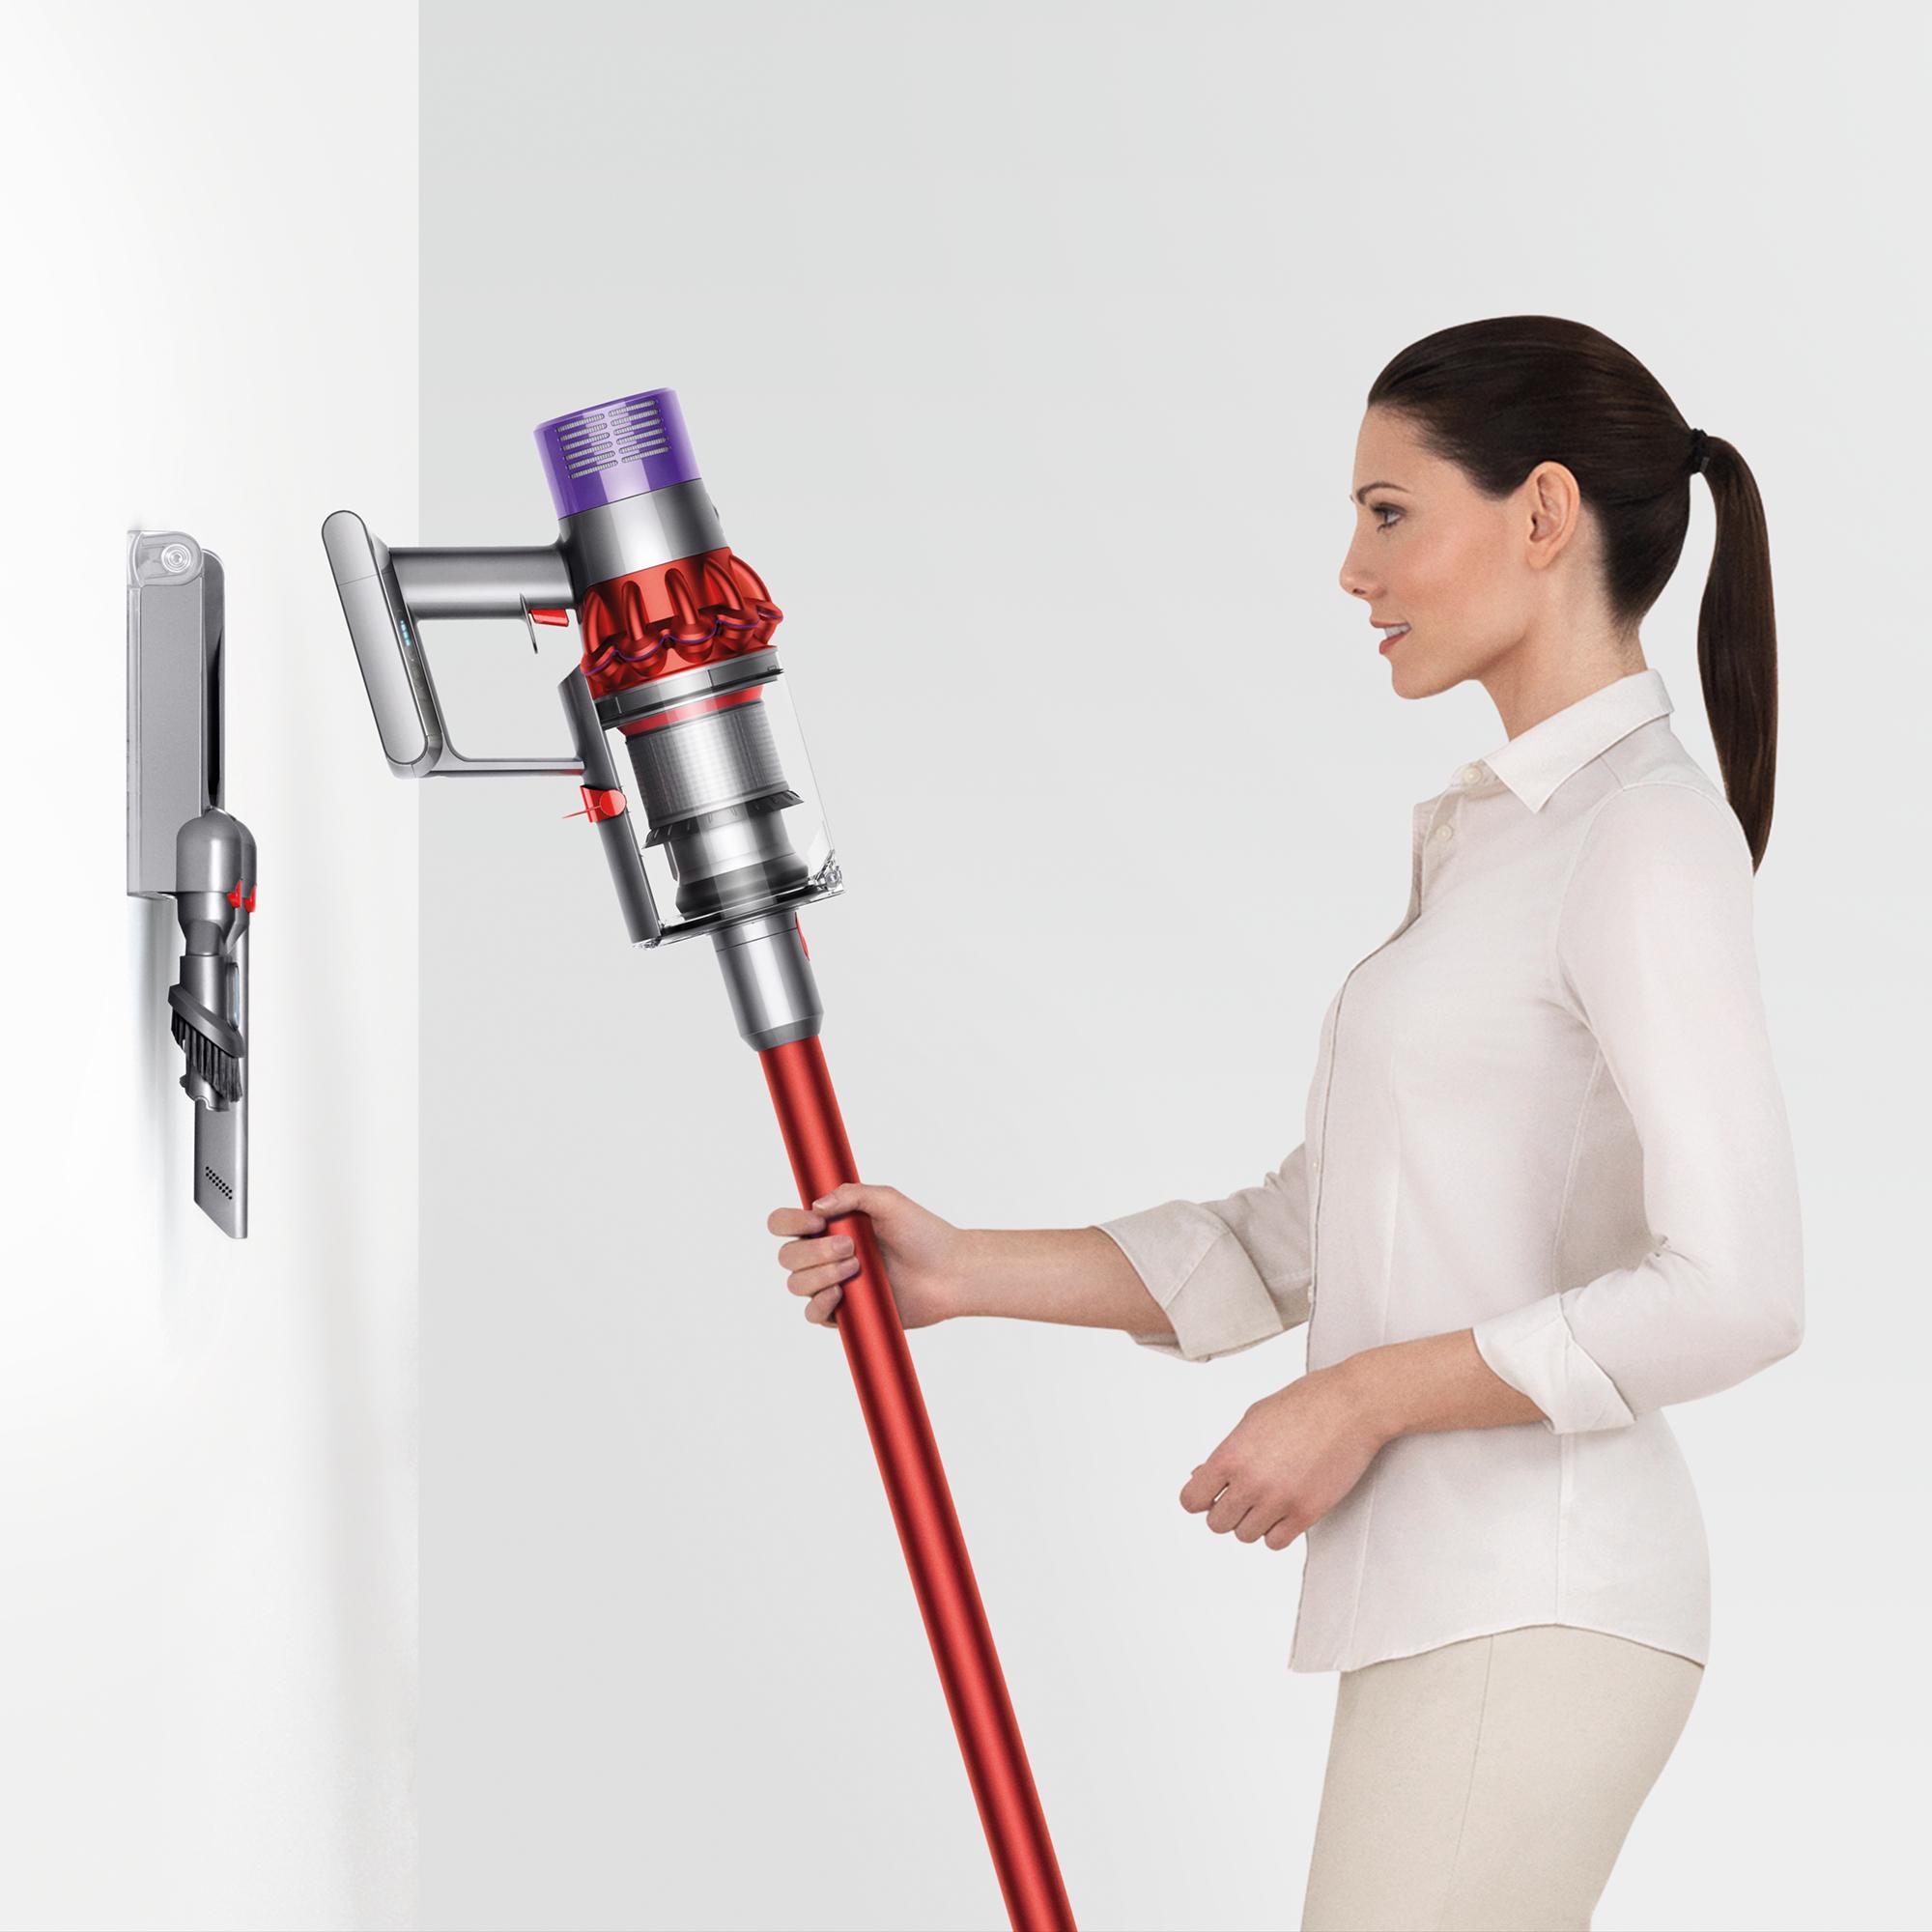 Dyson-V10-Animal-Pro-Cordless-Vacuum-Cleaner-Refurbished thumbnail 29